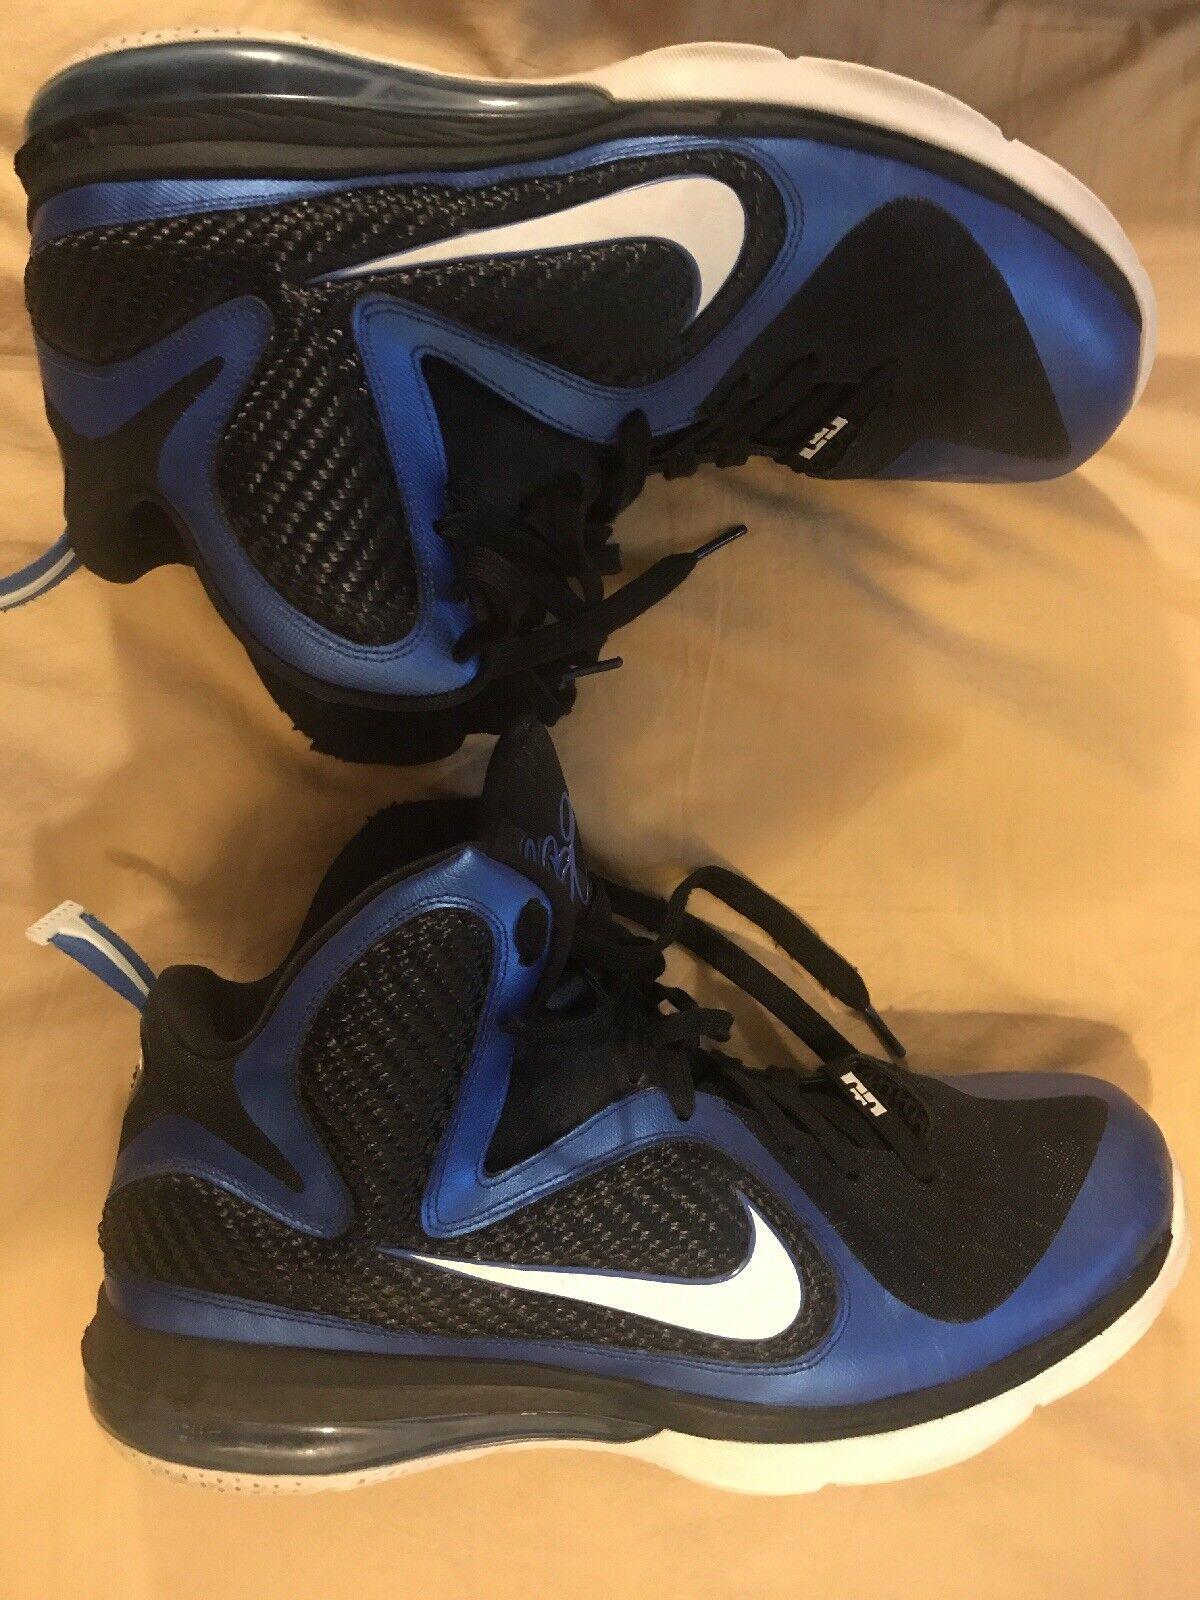 100% authentic Nike Lebron IX 9 Varsity Royal/White-Black Kentucky  Sz 13